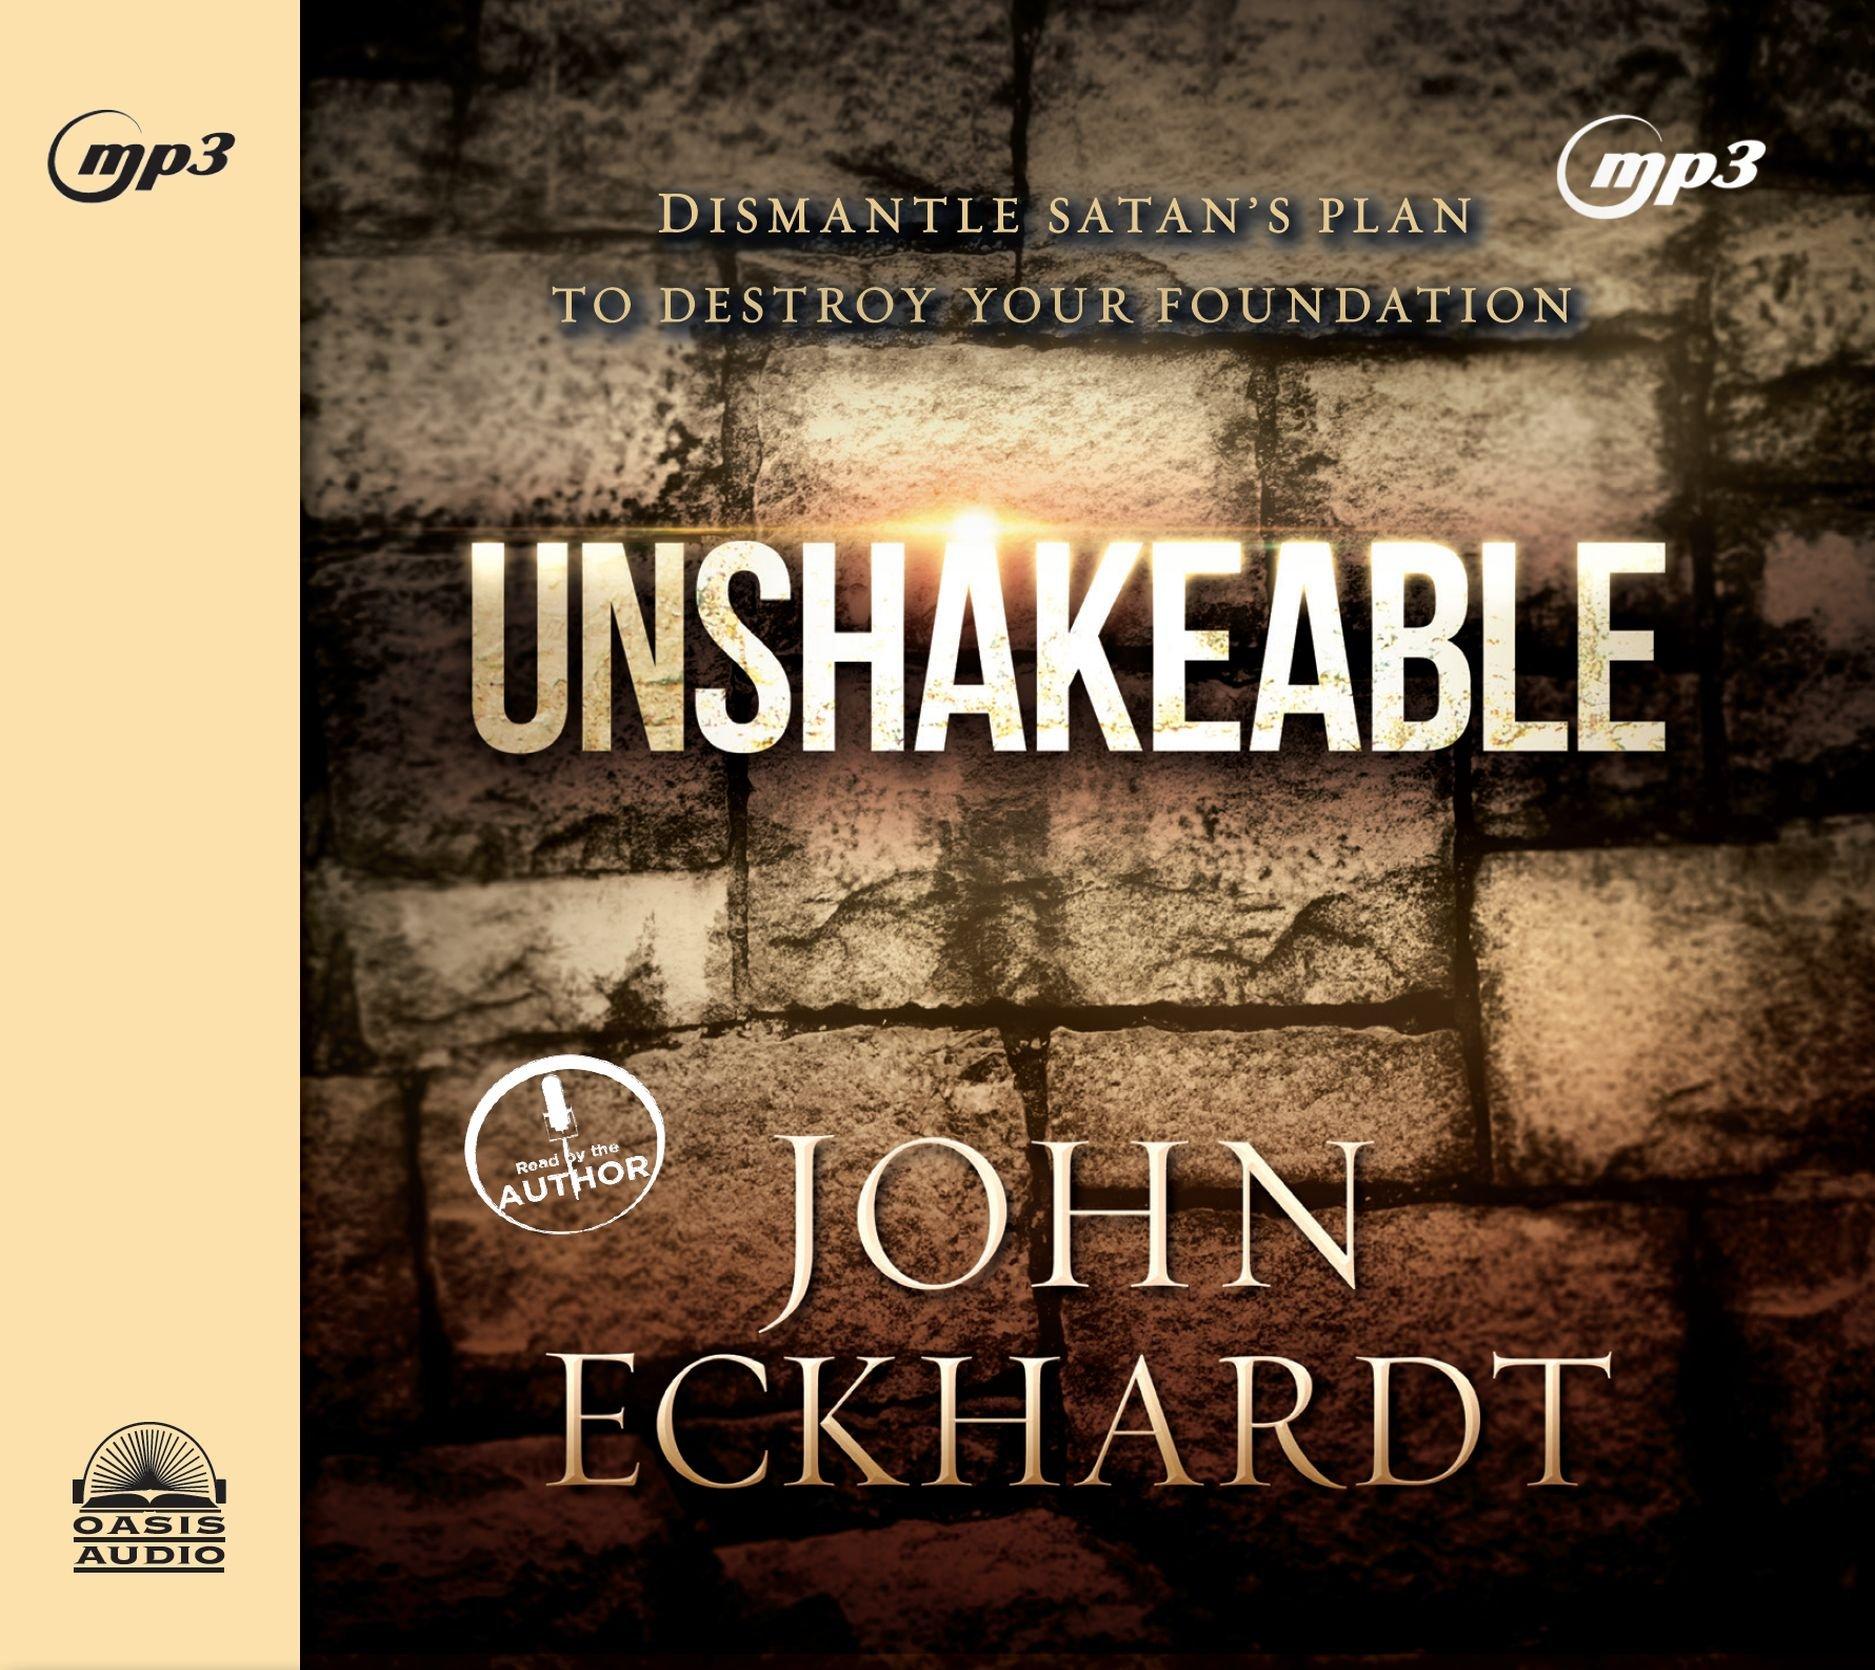 Buy Unshakeable: Dismantling Satan's Plan to Destroy Your